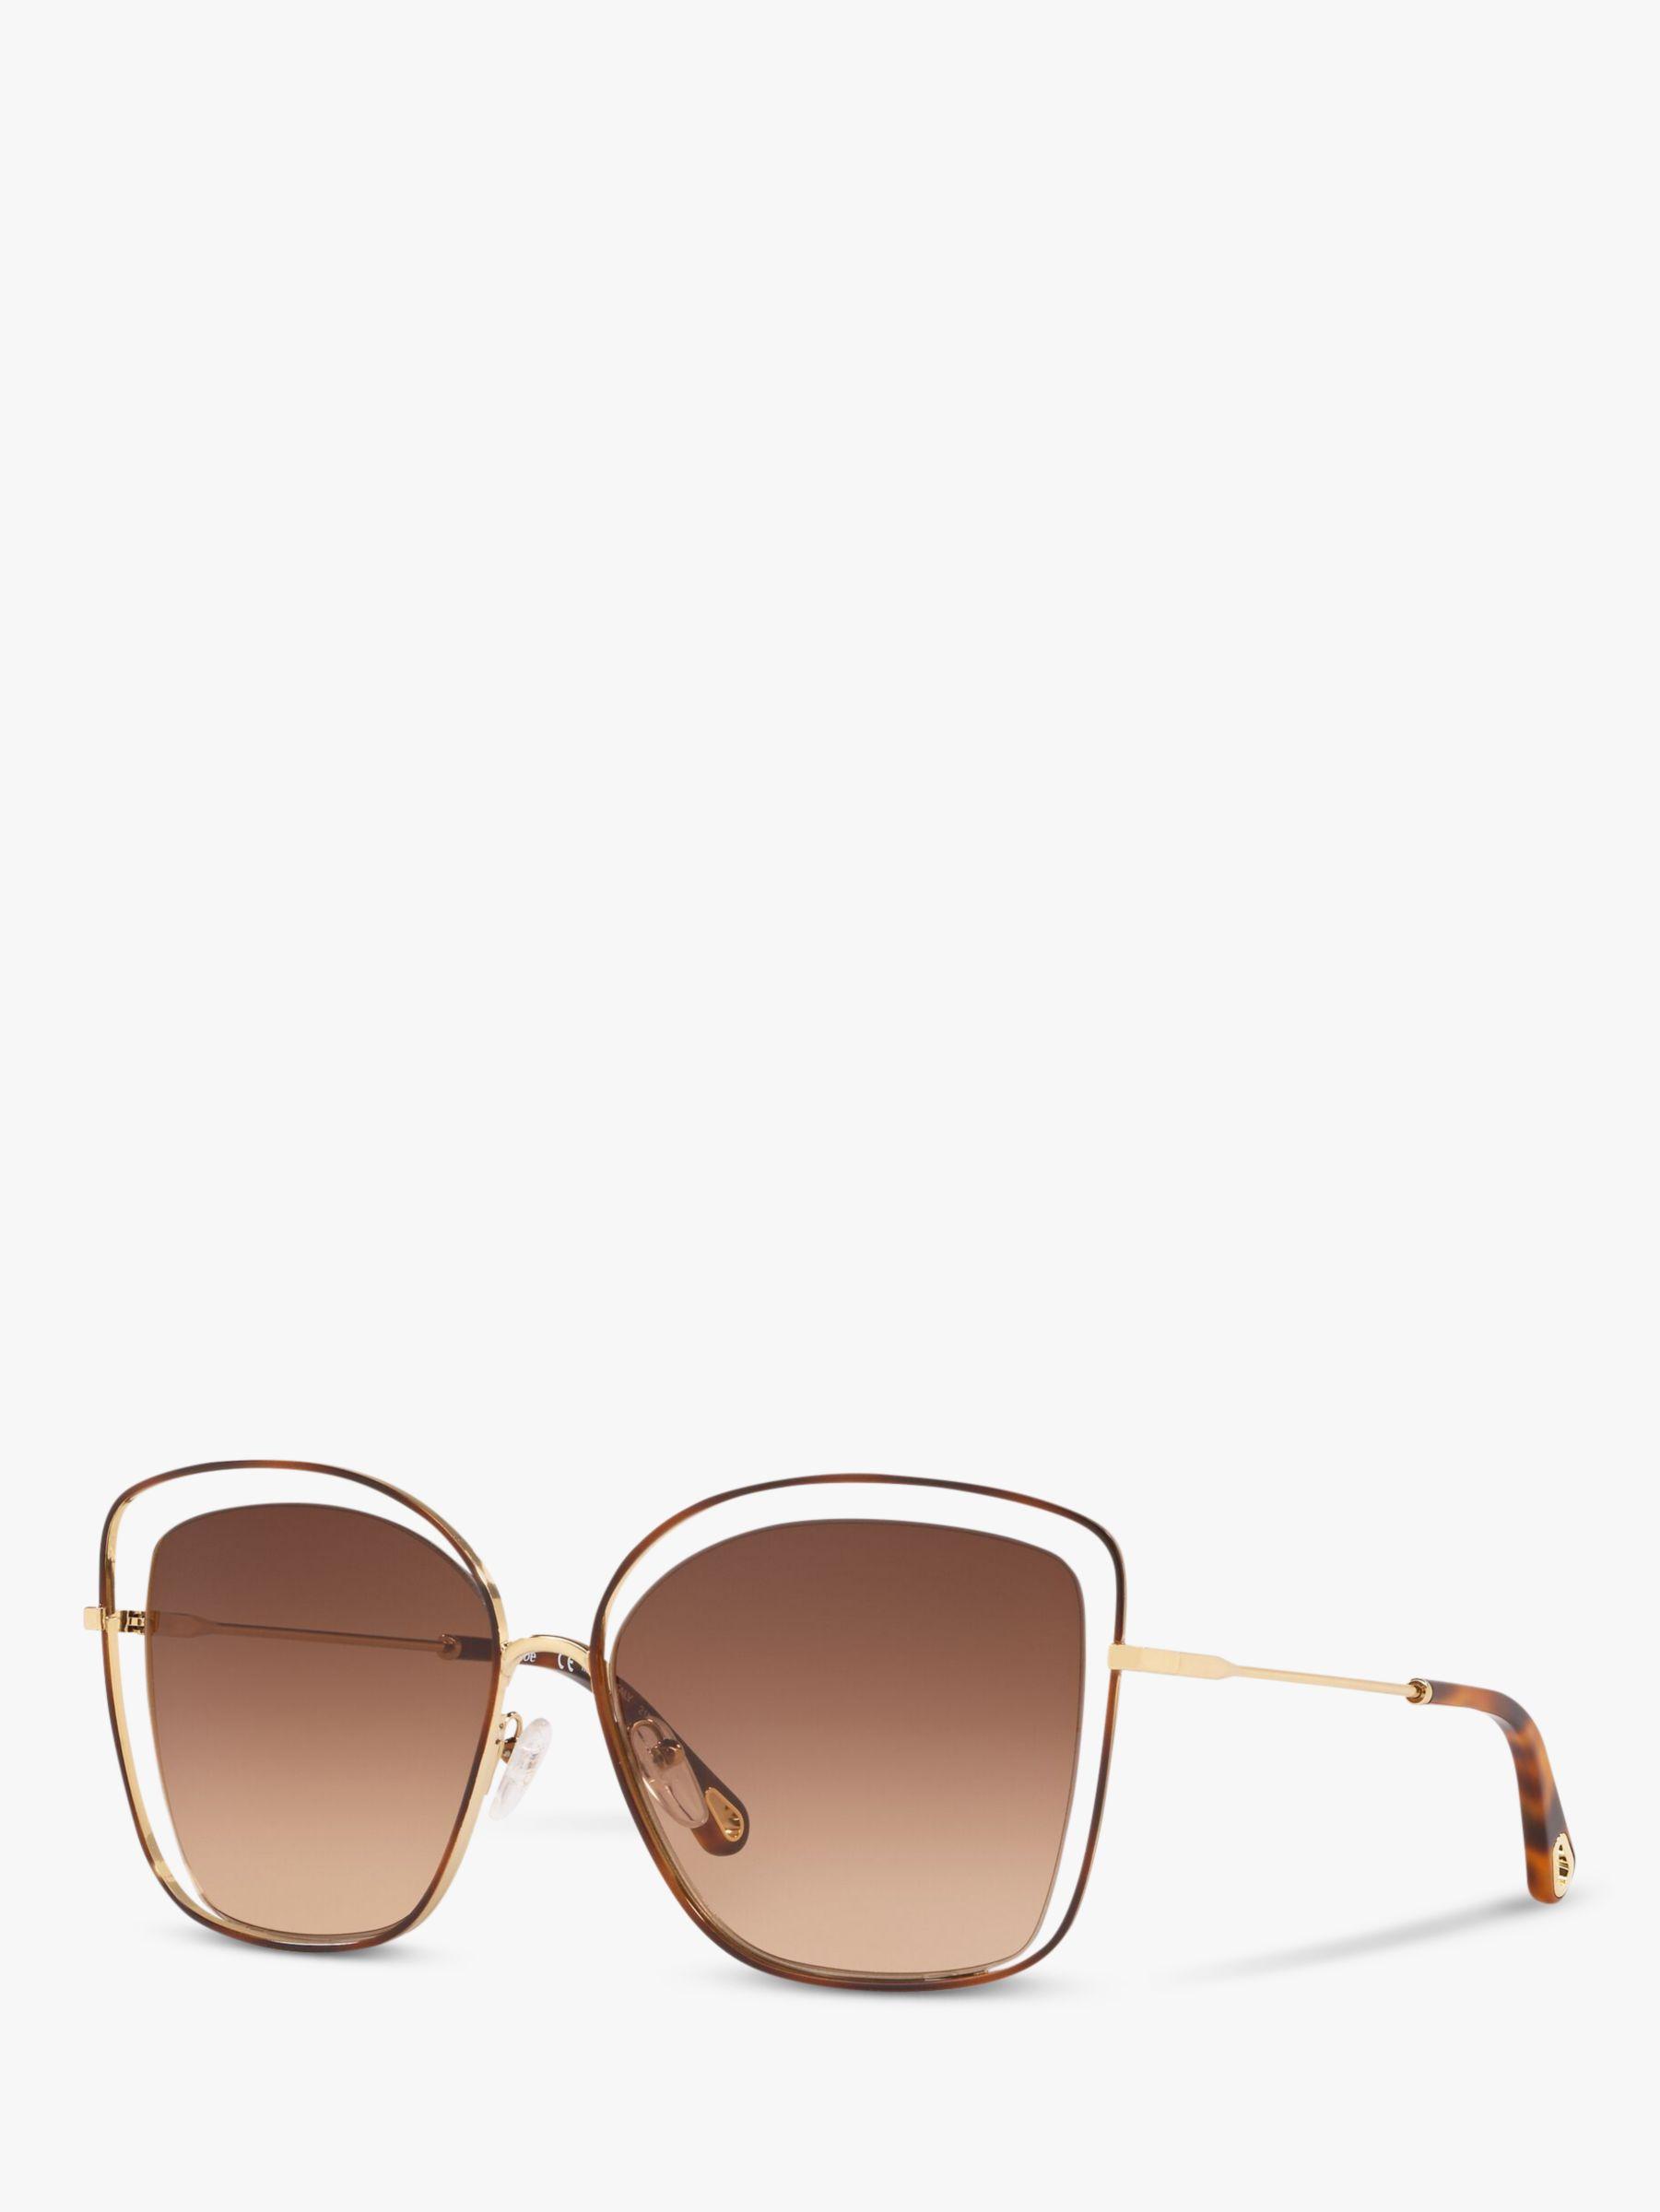 Chloe Chloé CE133S Women's Double Rim Square Sunglasses